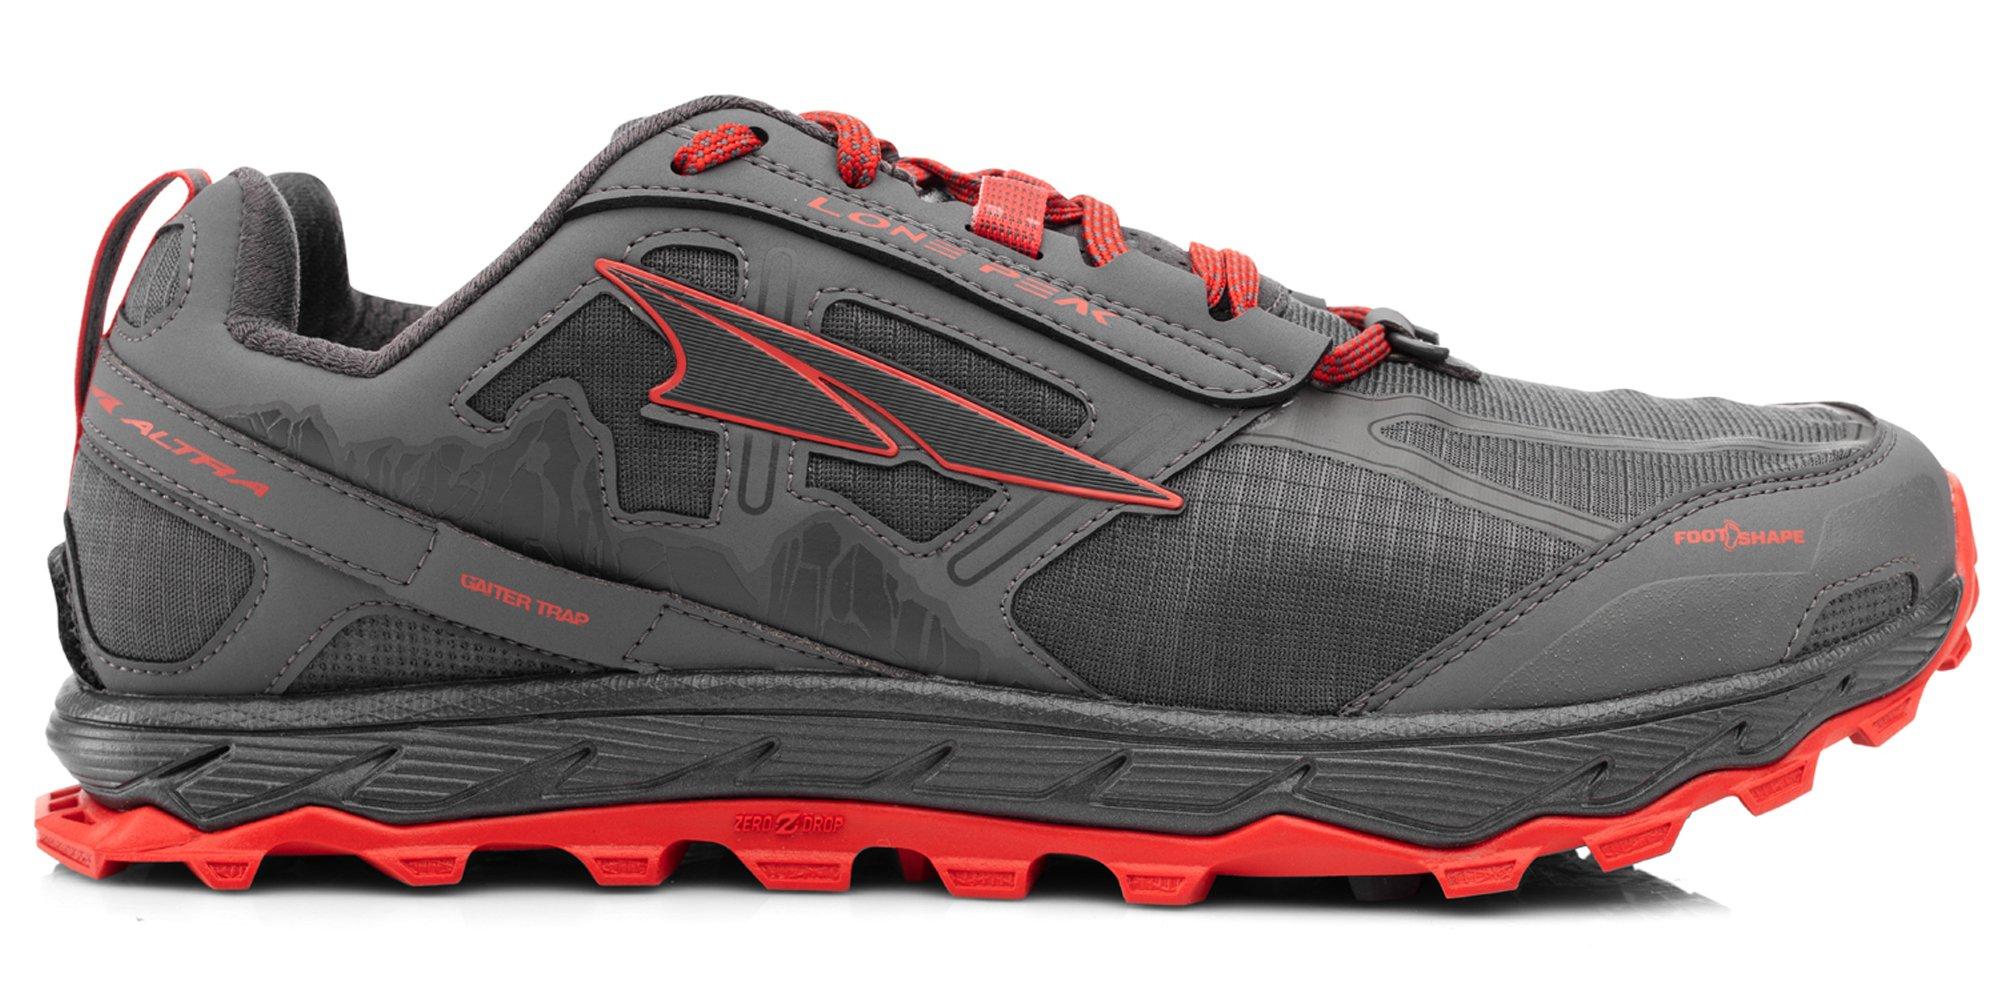 Altra AFM1855F Men's Lone Peak 4.0 Trail Running Shoe, Gray/Orange - 7 D(M) US